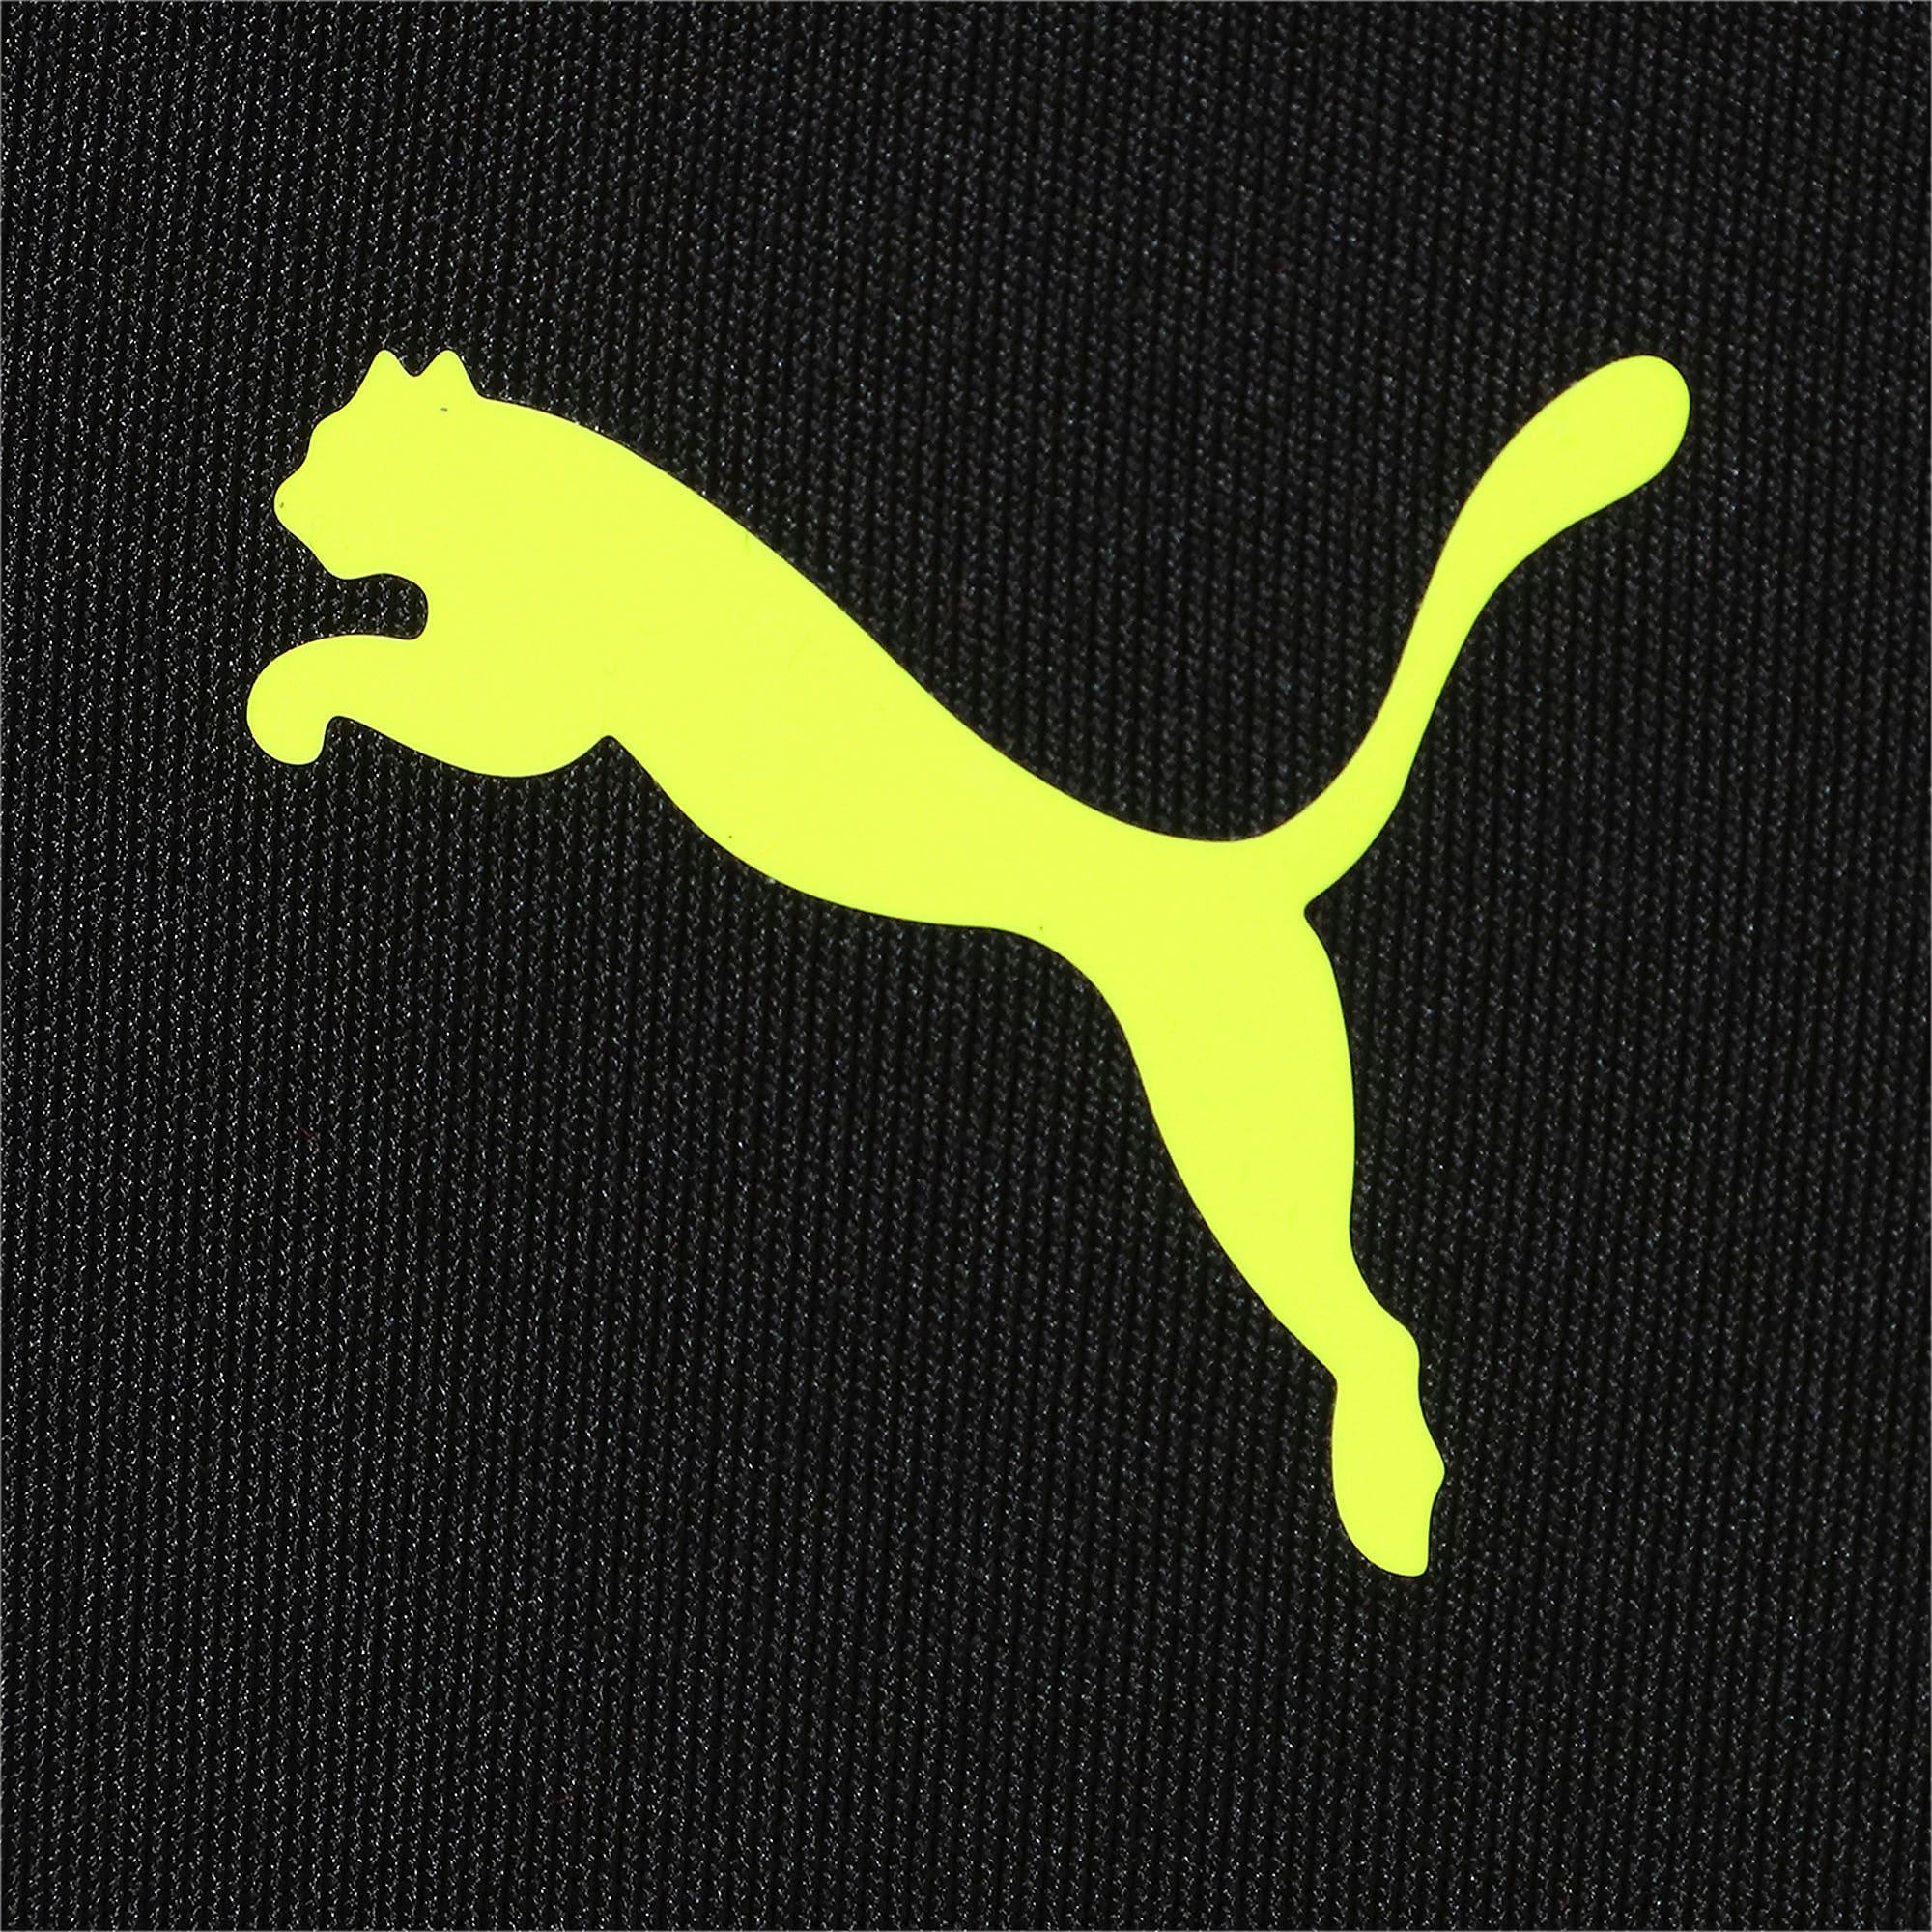 Thumbnail 7 of フィール イット ウィメンズ トレーニング 7/8 タイツ V, Puma Black-Yellow Alert, medium-JPN